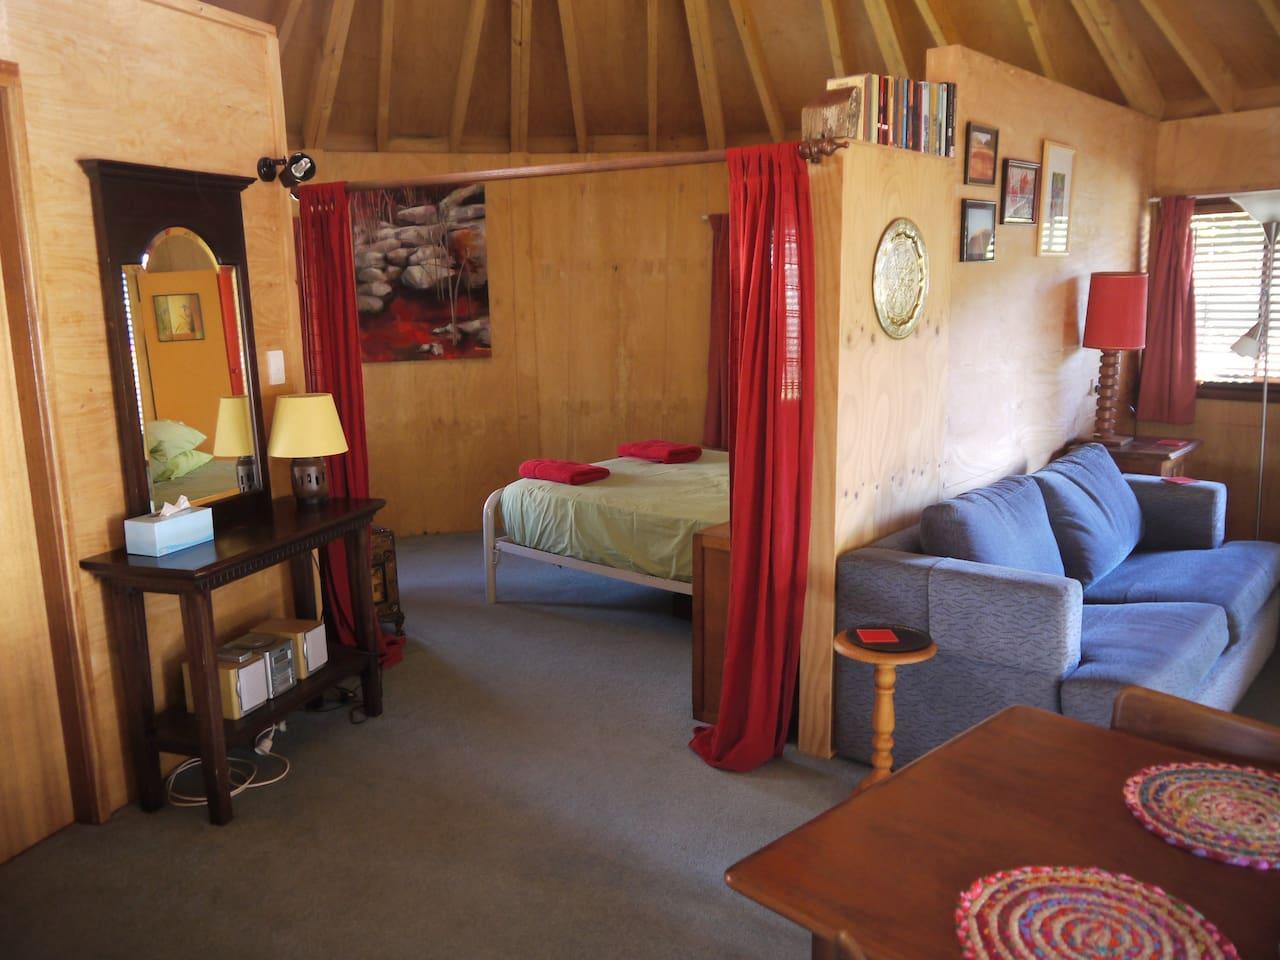 Comfortable and  cosy interior.